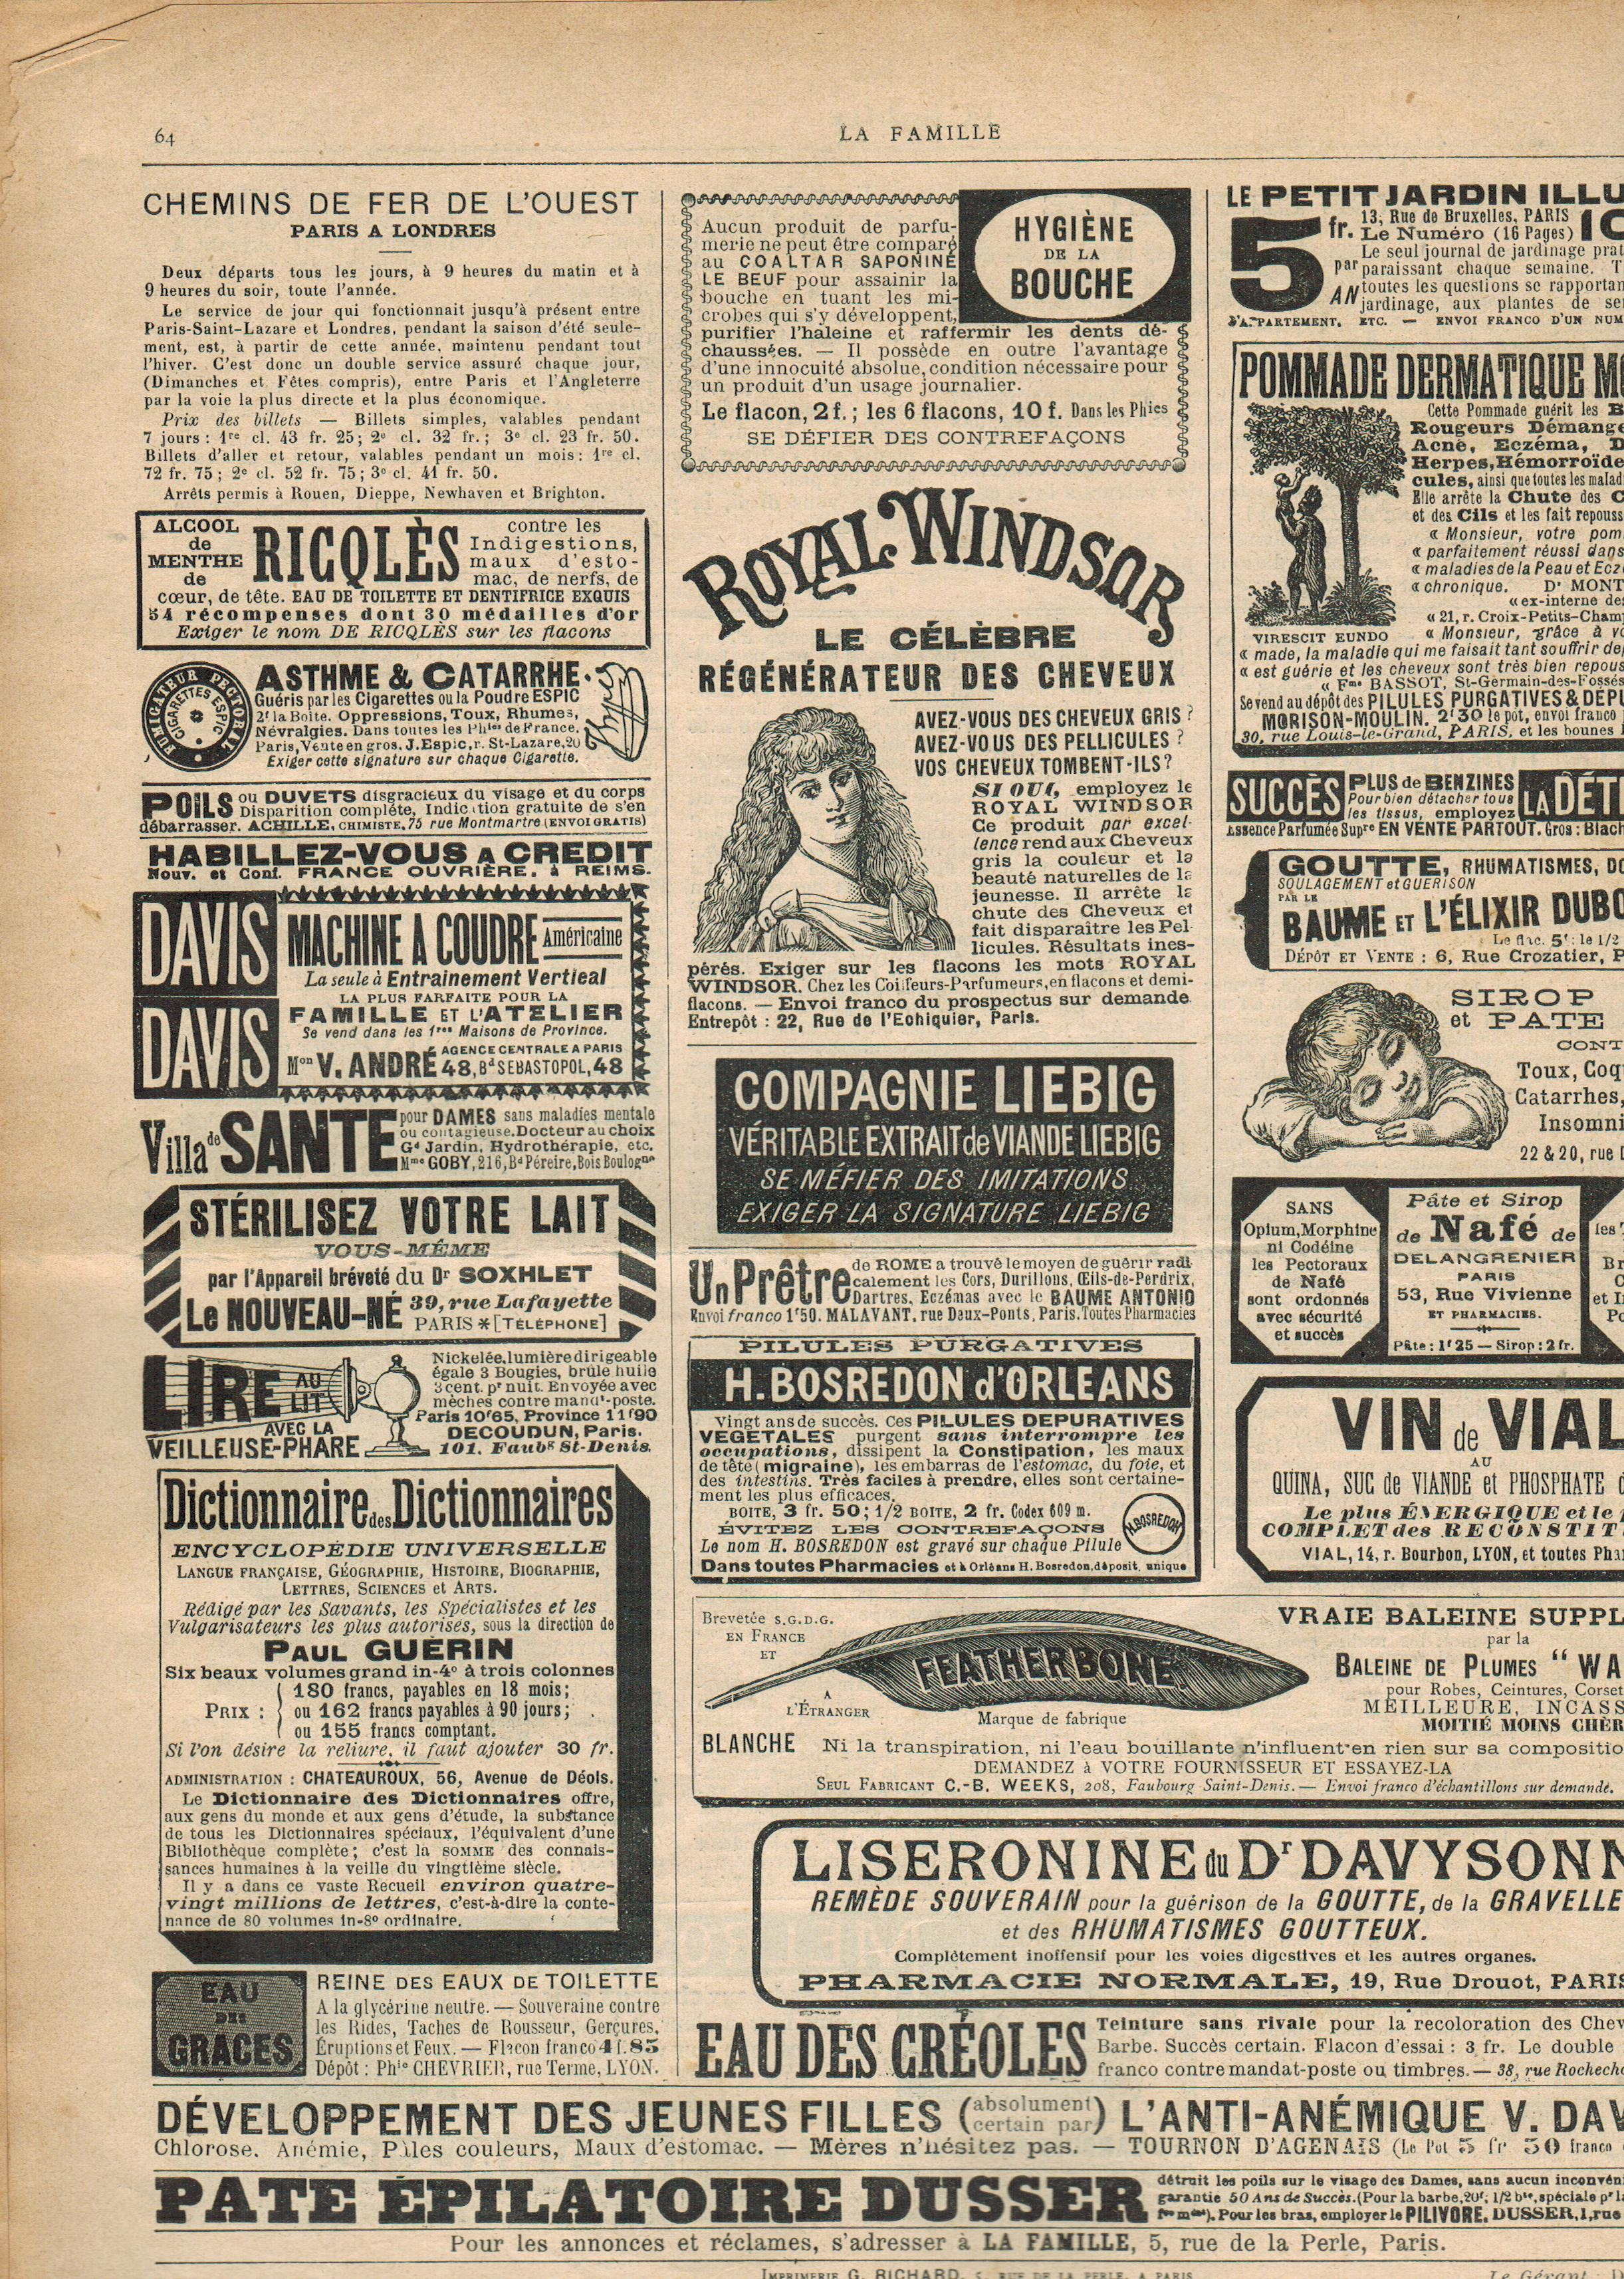 LA FAMILLE Pderniere 28 01 1894